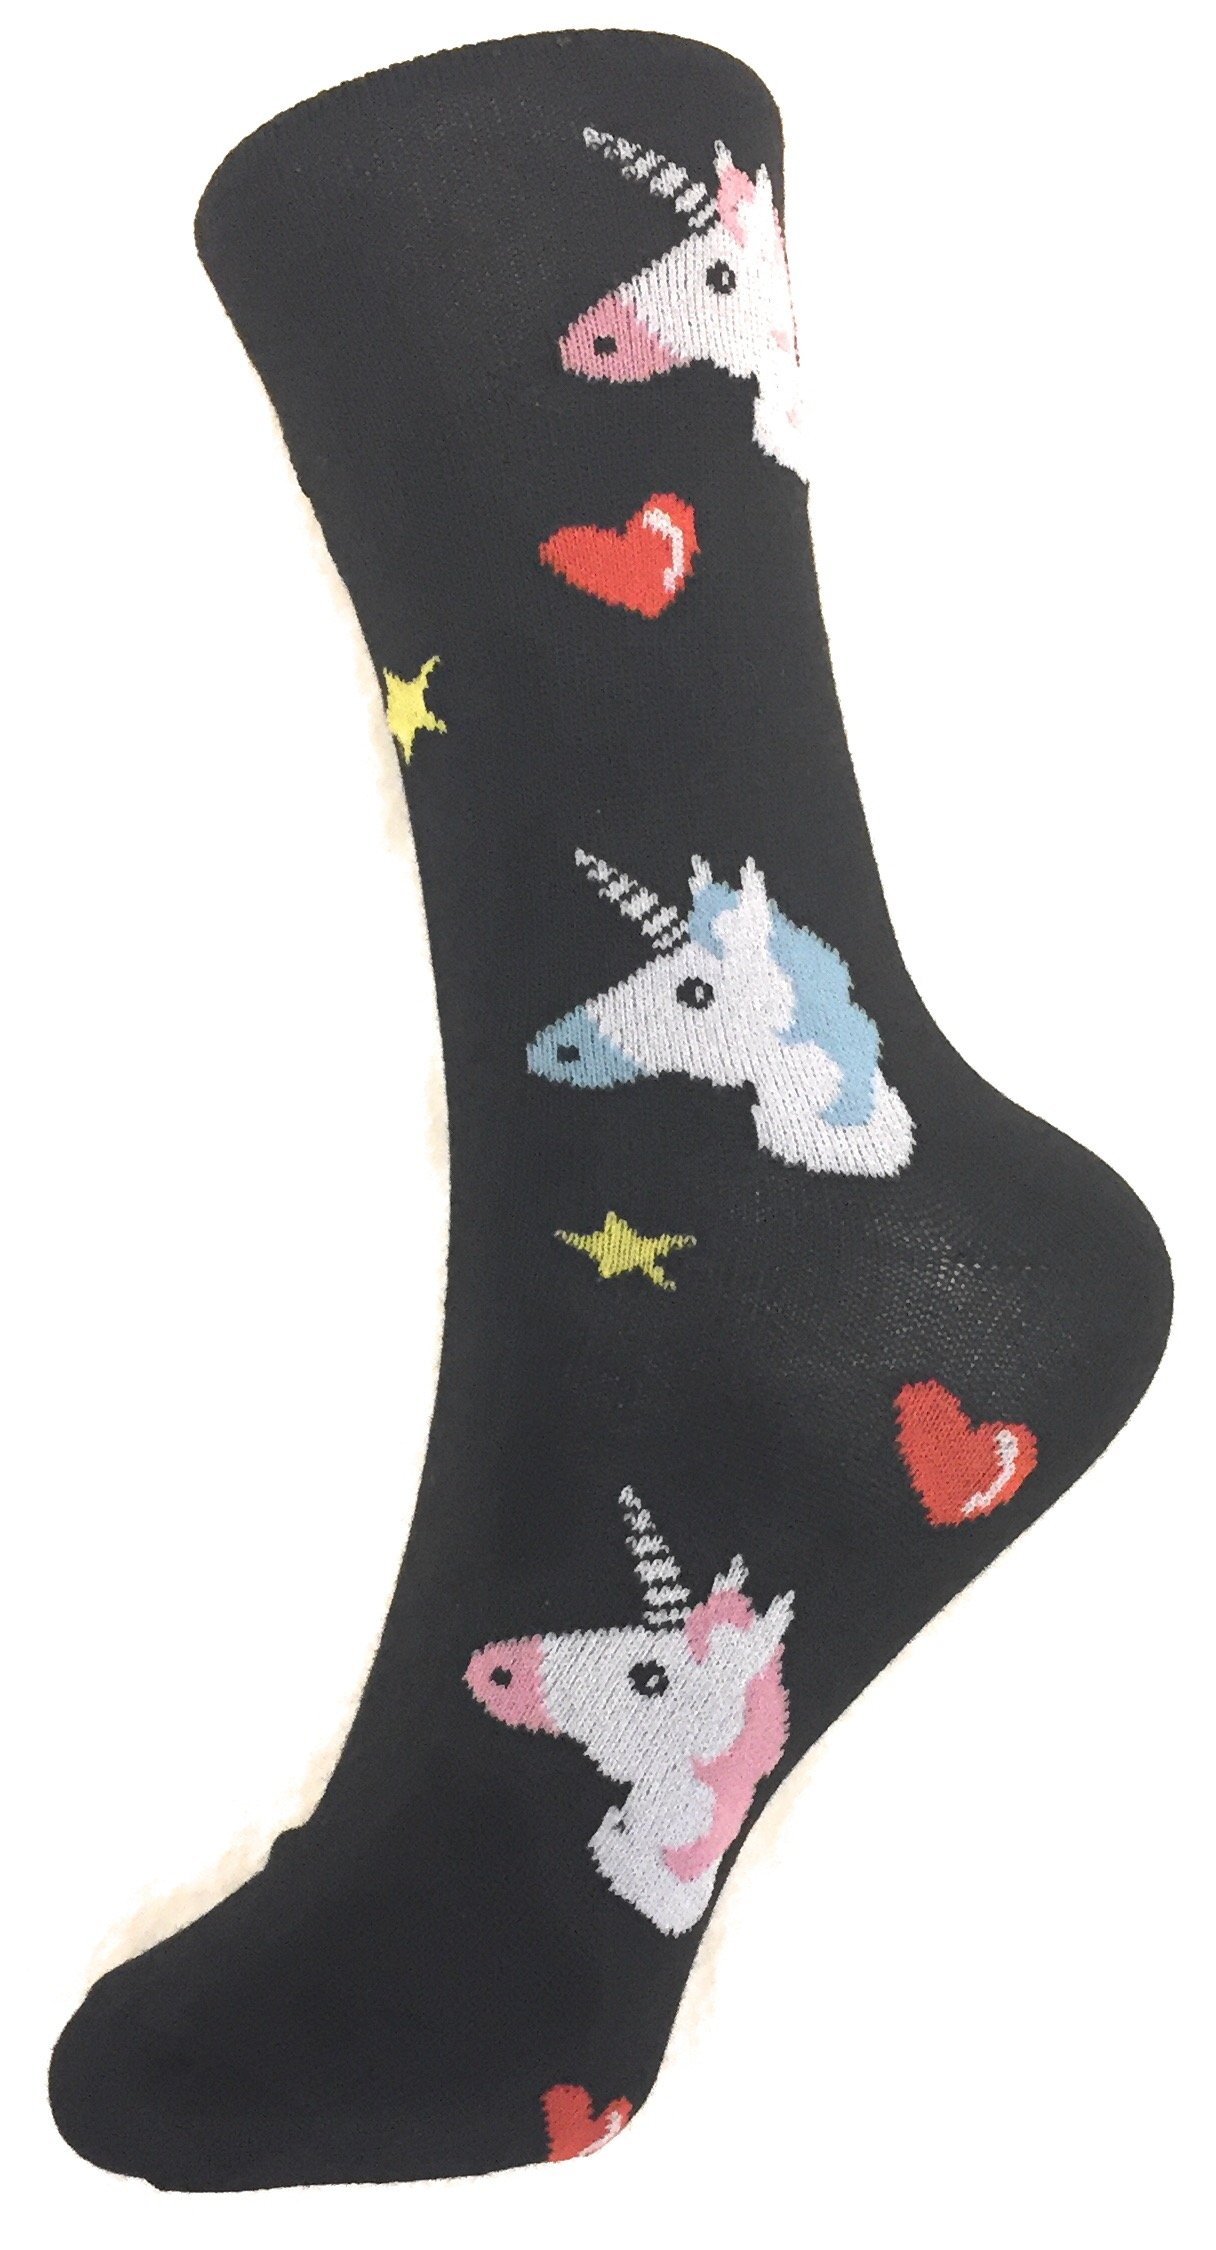 Socks-Women Crew Novelty Comfy Cozy, Trendy, Fashionable and Fun Patterns To Love (UNICORN-BLACK)